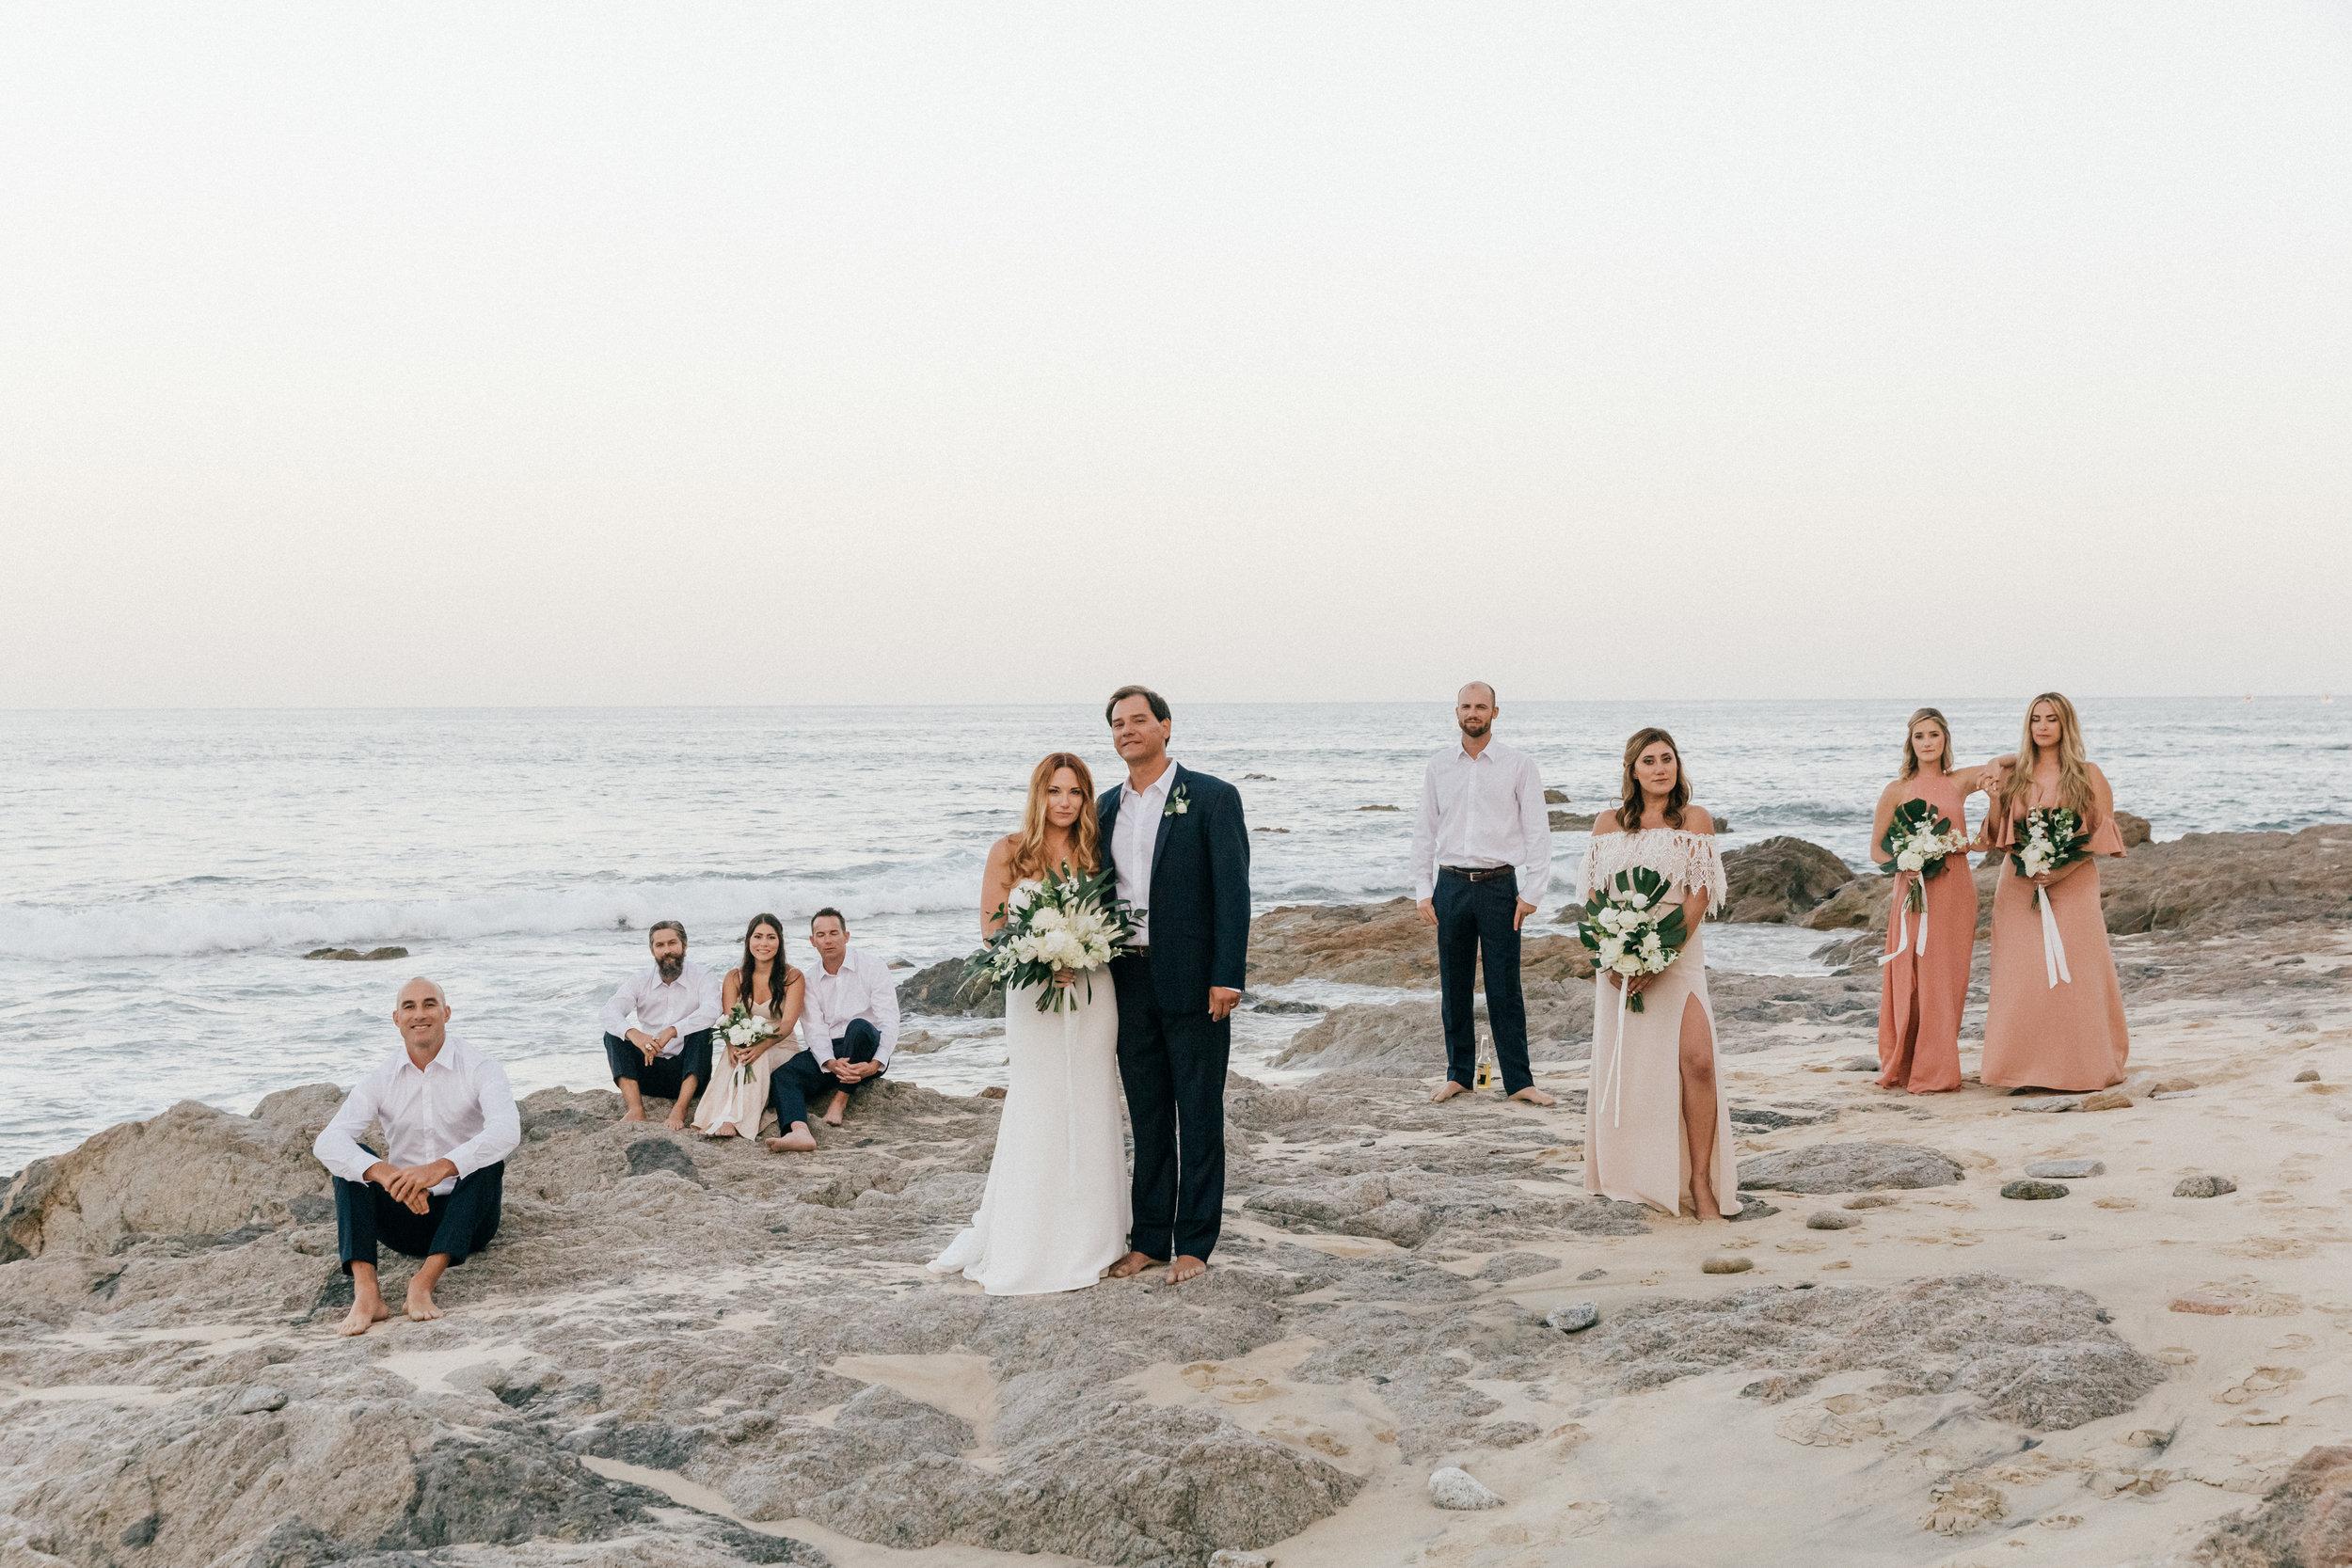 WeddingHailley Howard October 10 2017 Hailley Wedding Photography Weddings